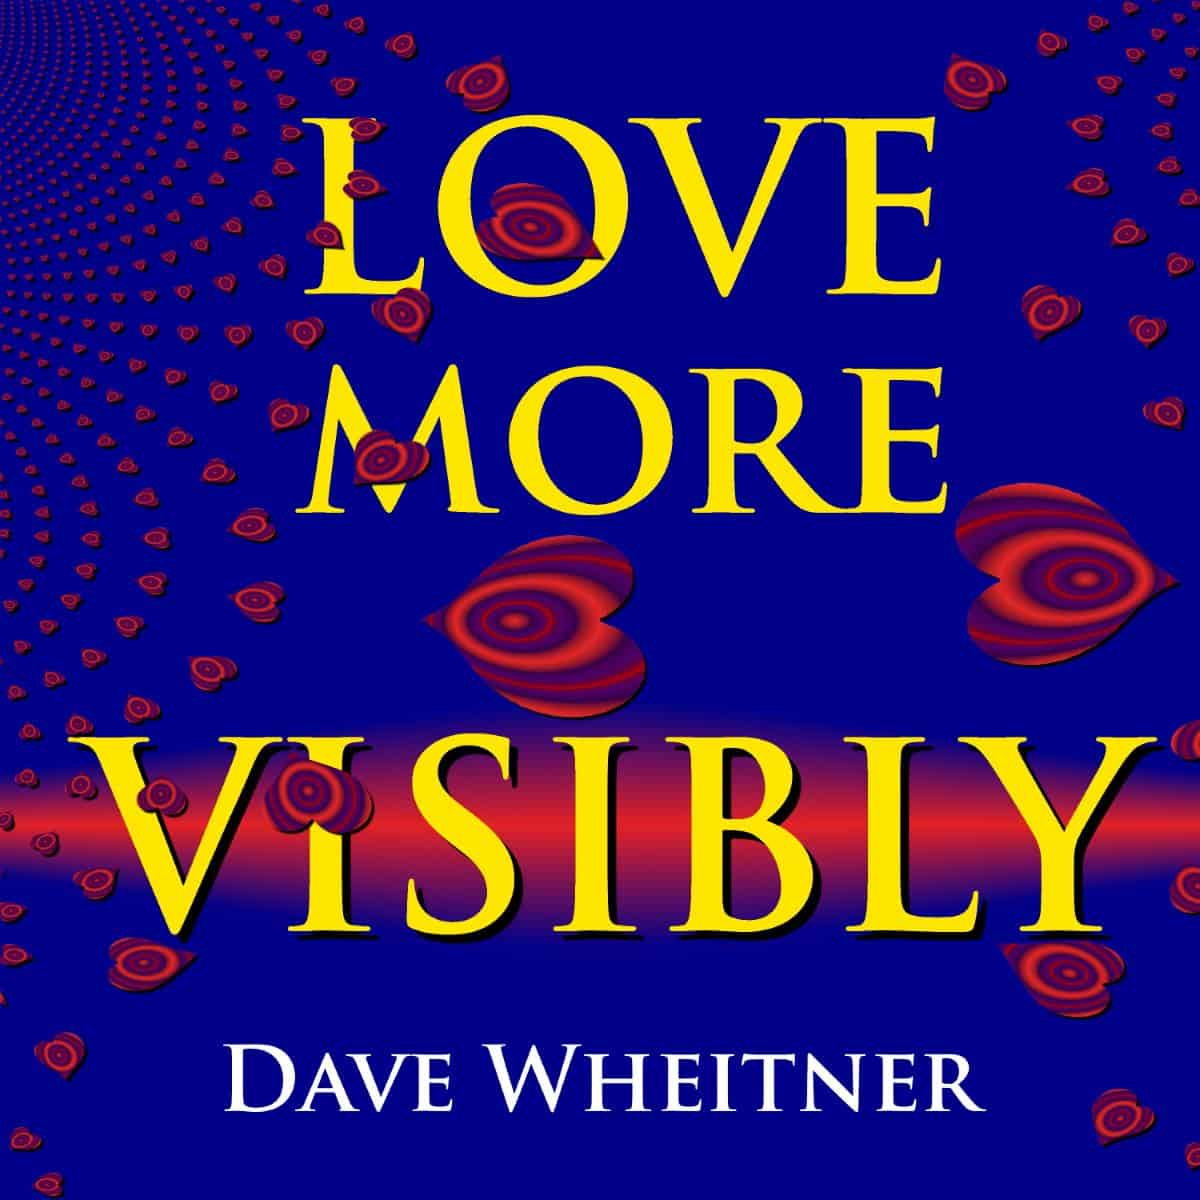 Love More Visibly album art